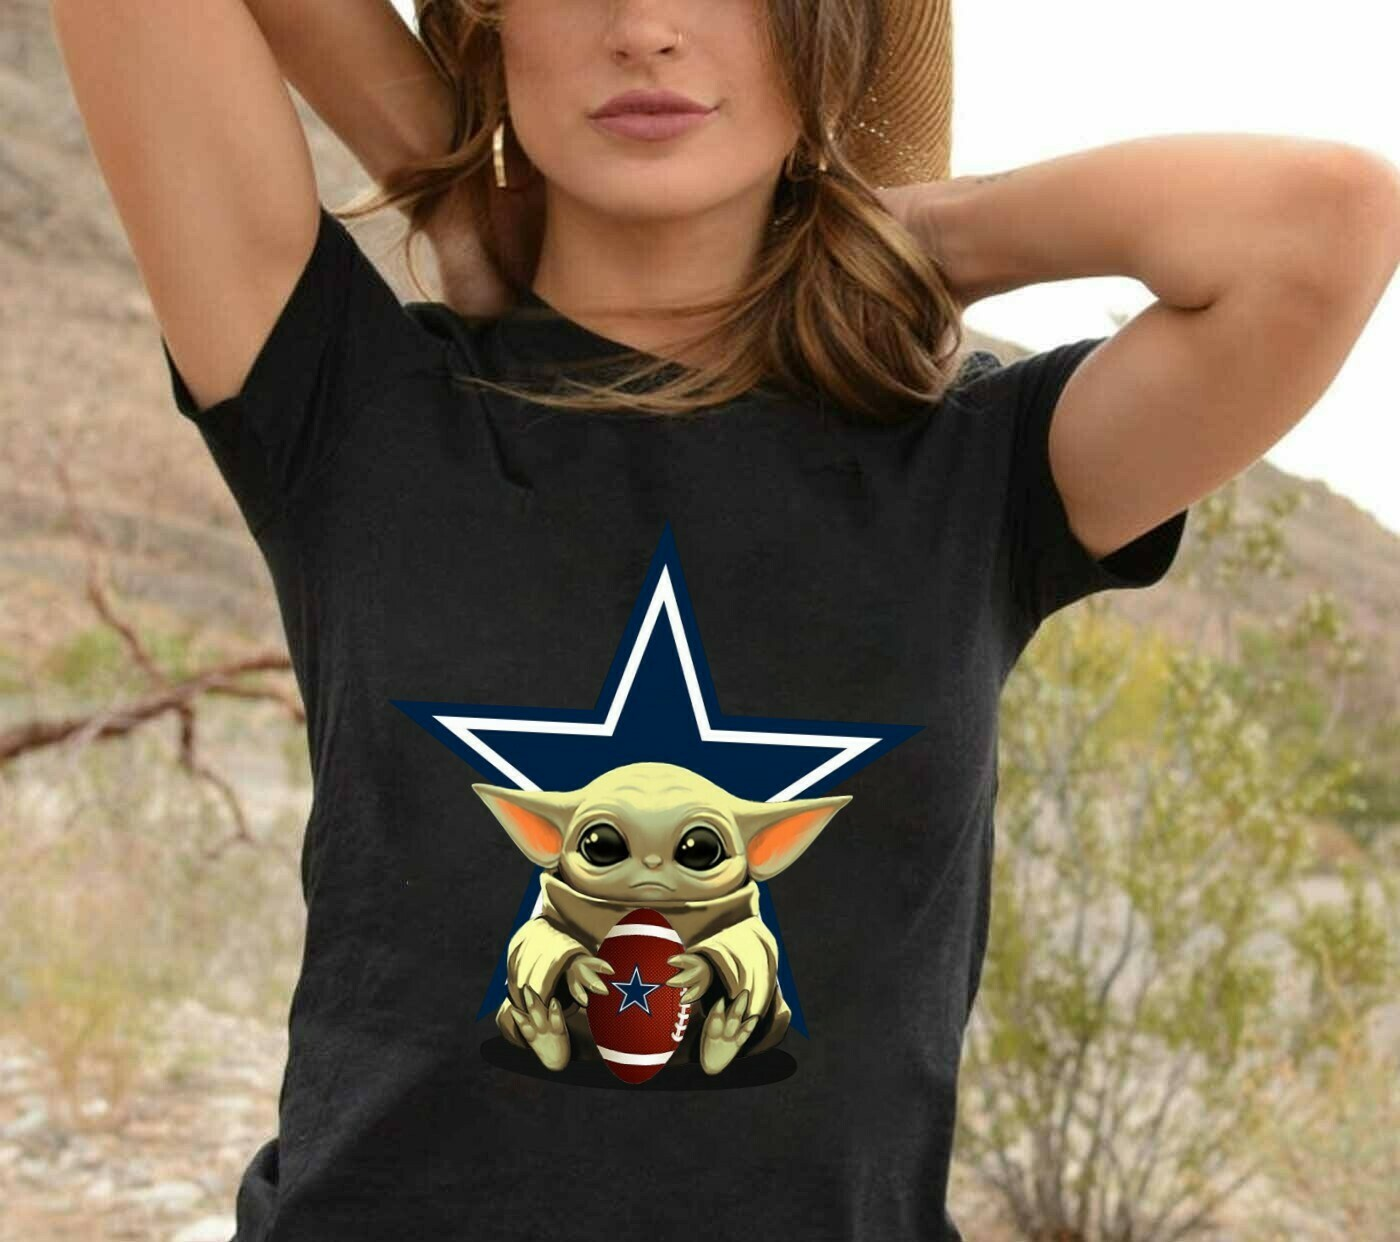 Dallas Cowboys Baby Yoda Star Wars The Mandalorian The Child First Memories Floating NFL Football Team Dad Mon Kid Fan Gift T-Shirt Long Sleeve Sweatshirt Hoodie Jolly Family Gifts